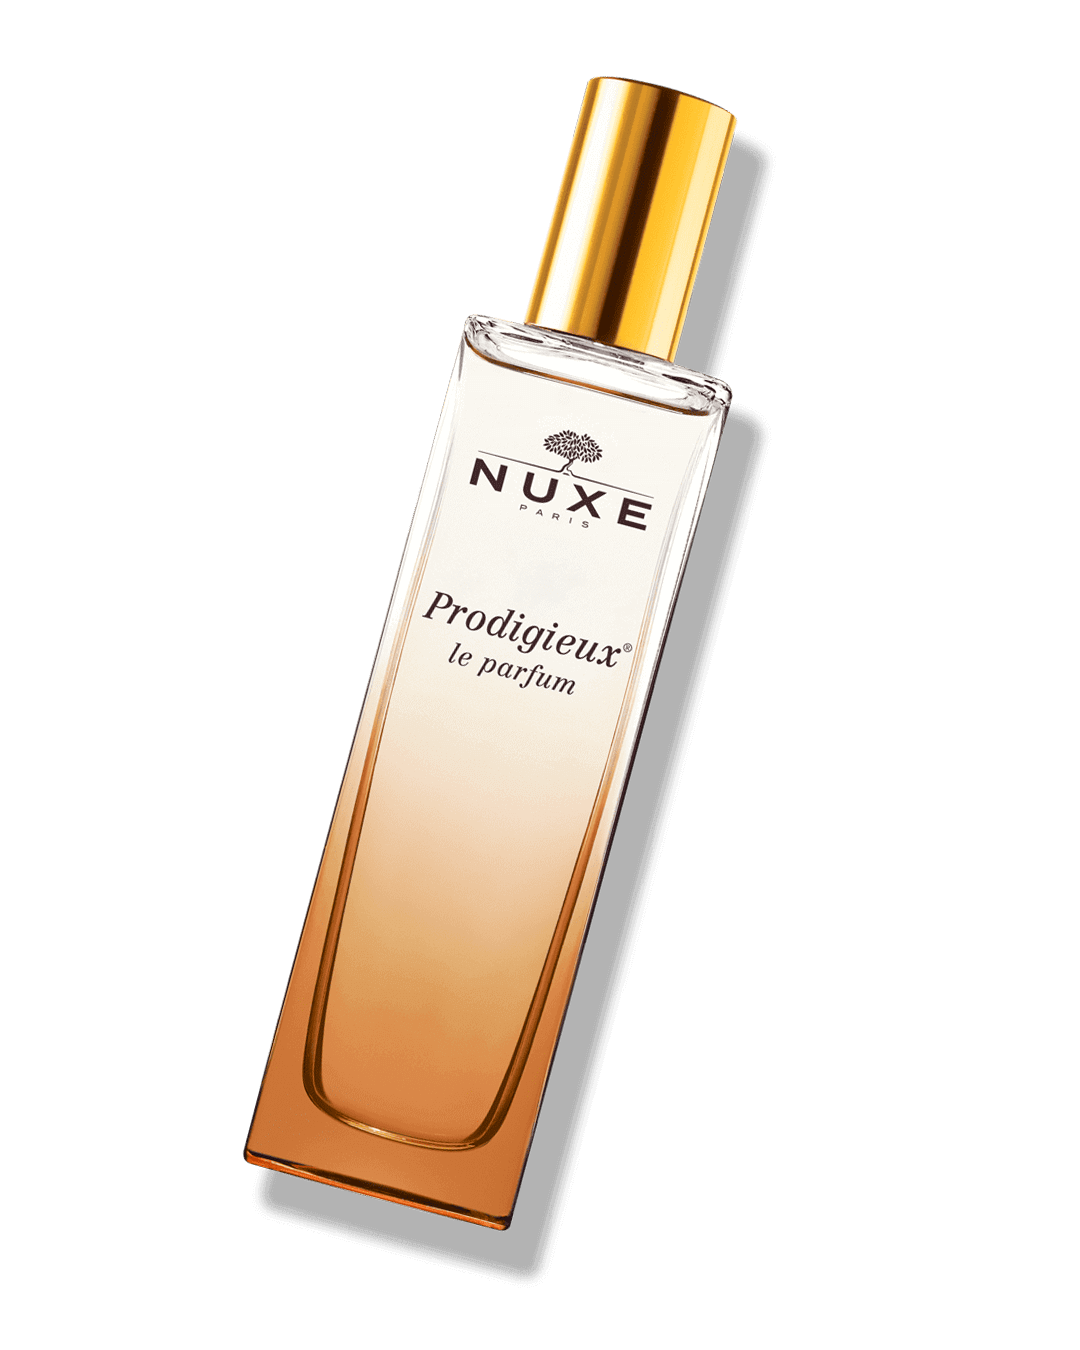 Prodigieux Le Parfum parfémová voda